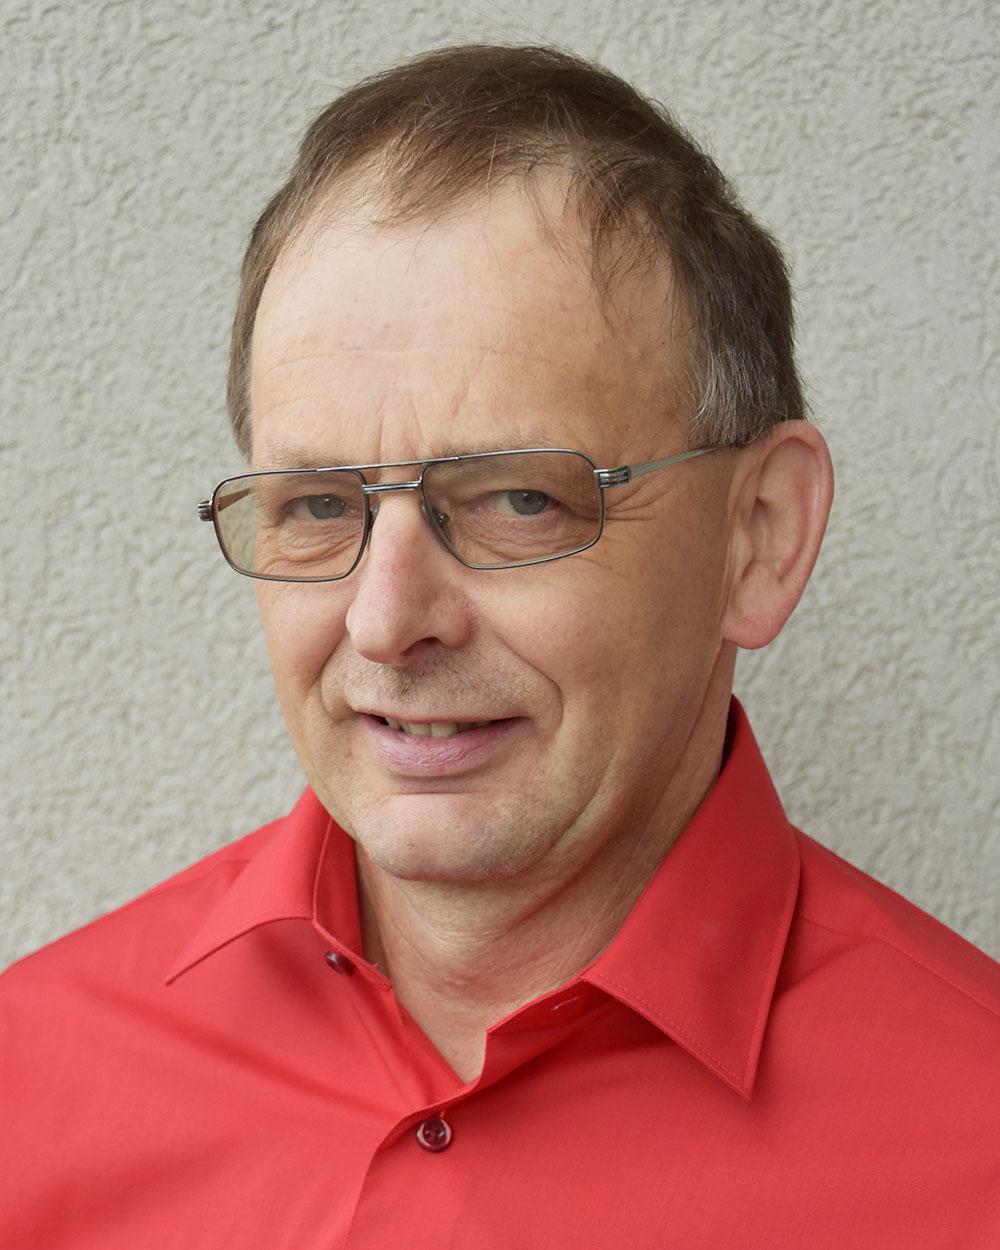 Hansruedi Unternährer